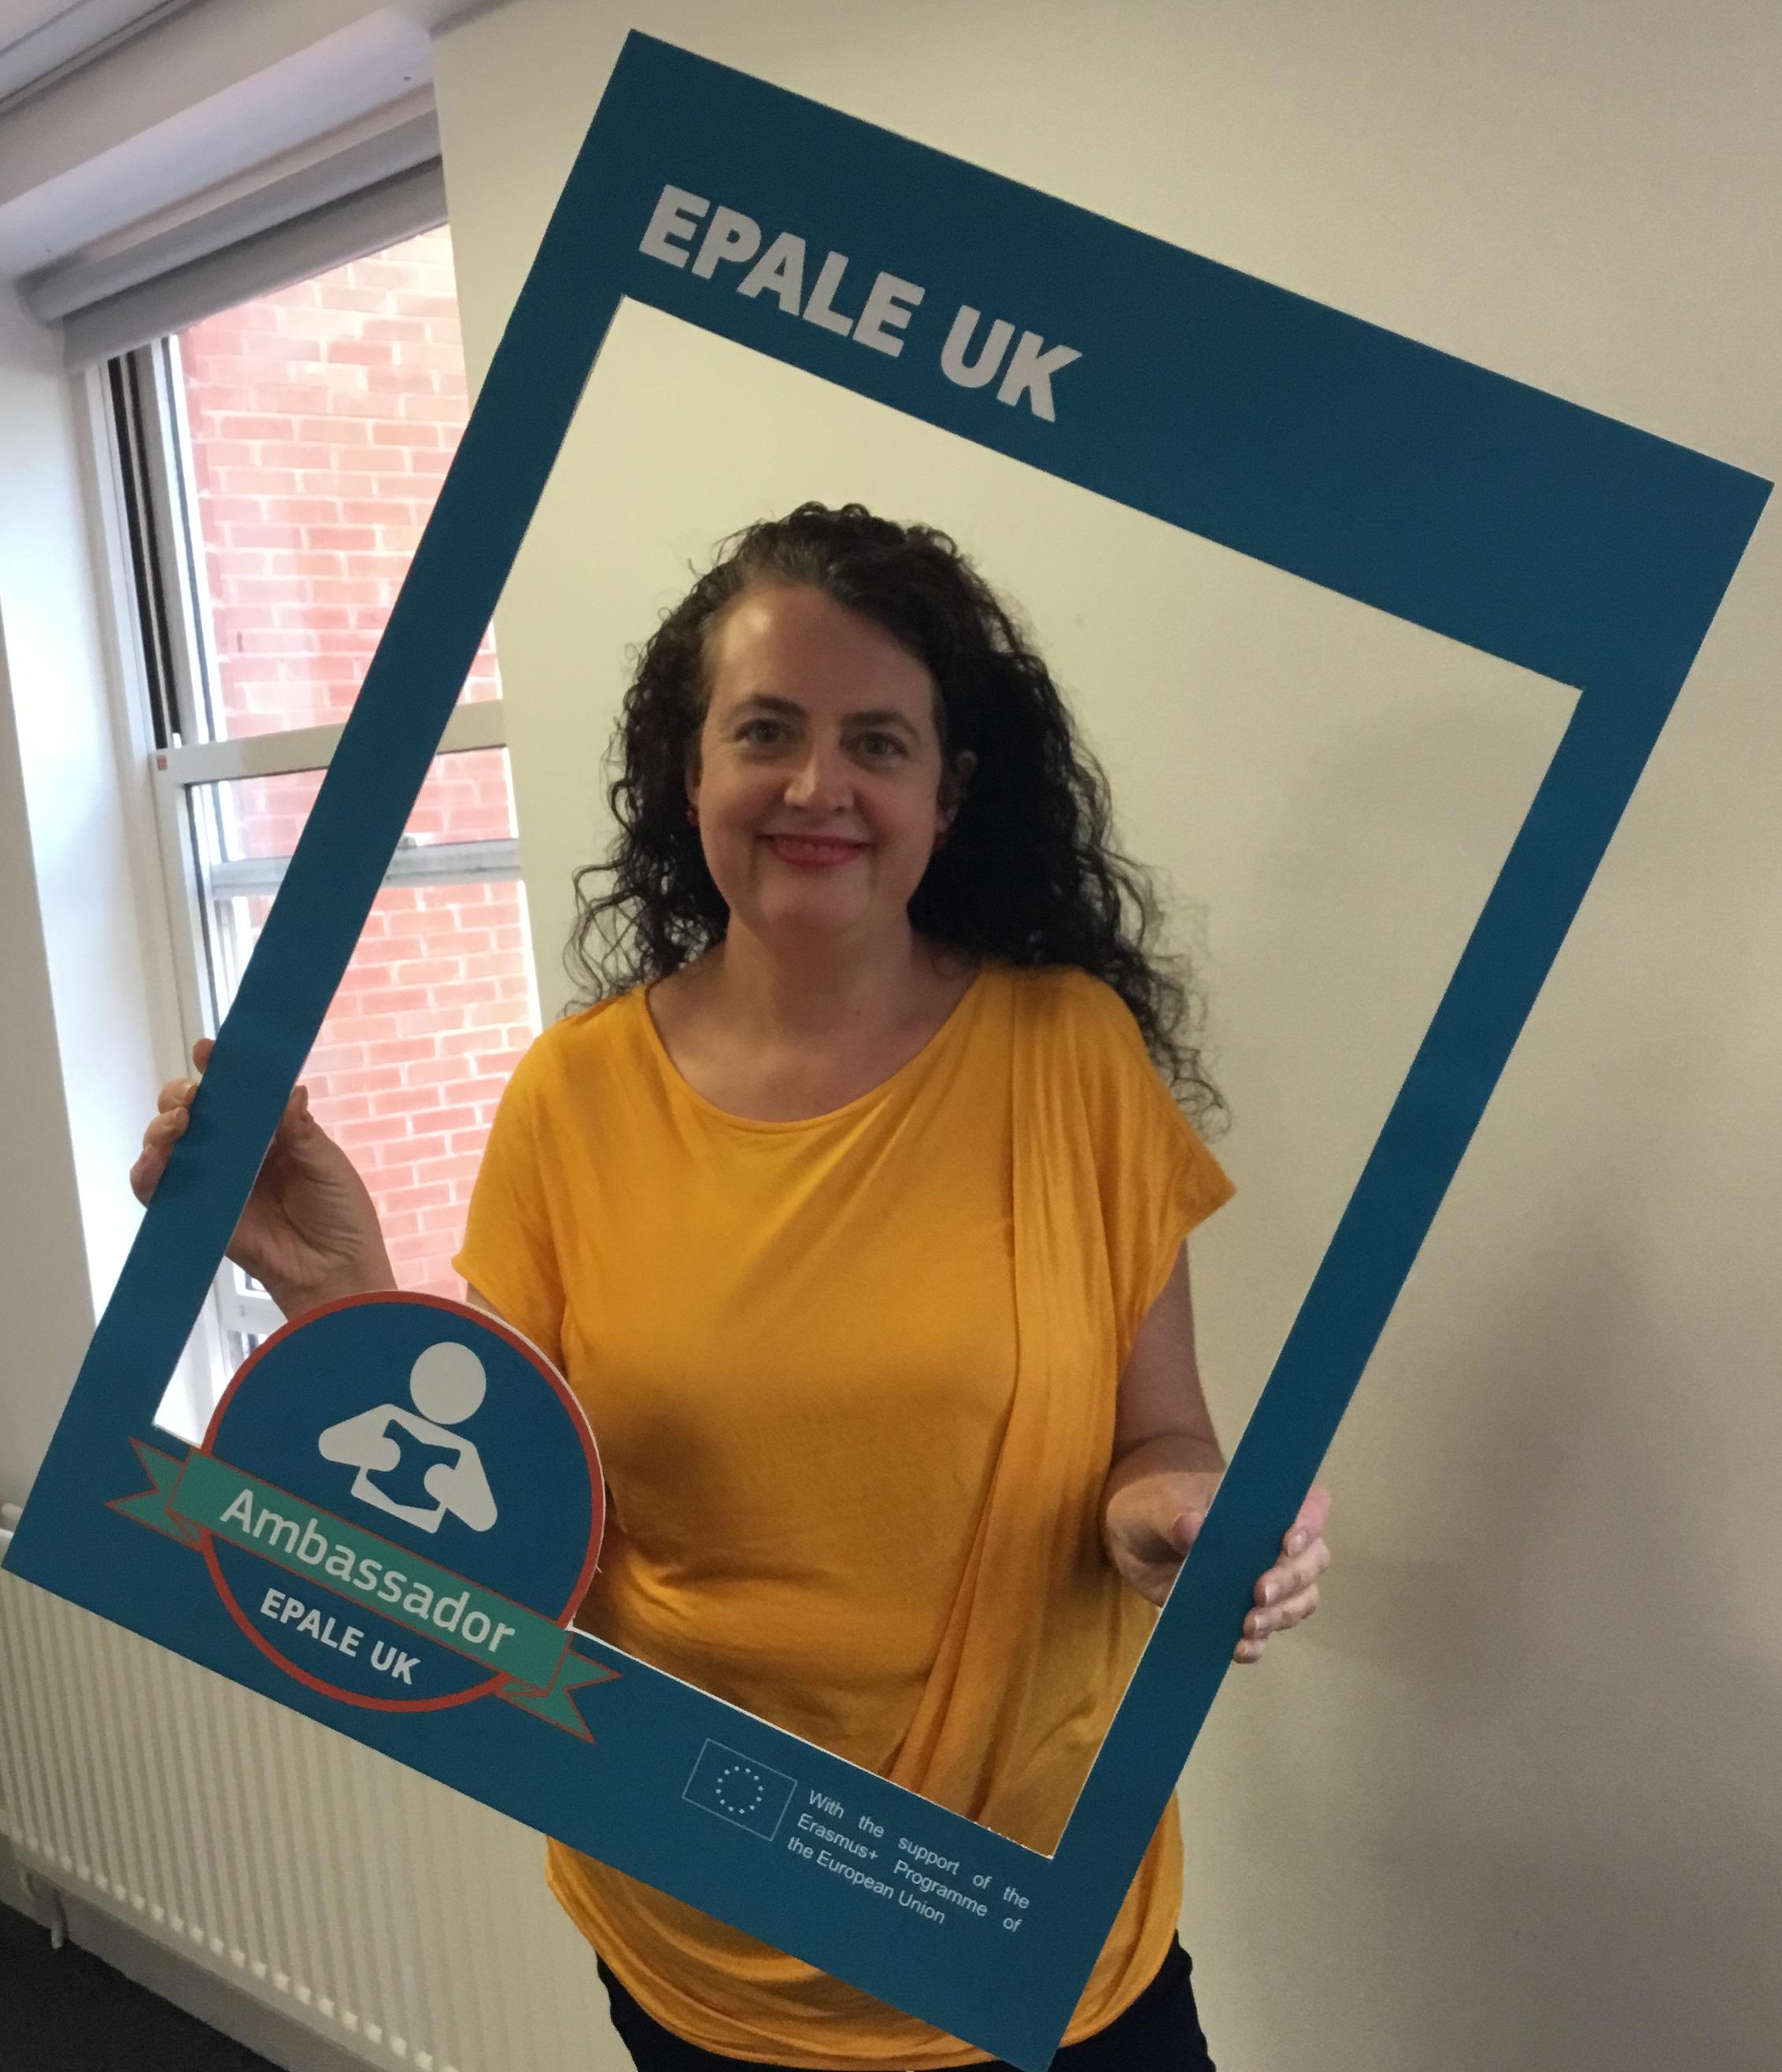 A photo of EPALE UK Ambassador Jo Fletcher-Saxon